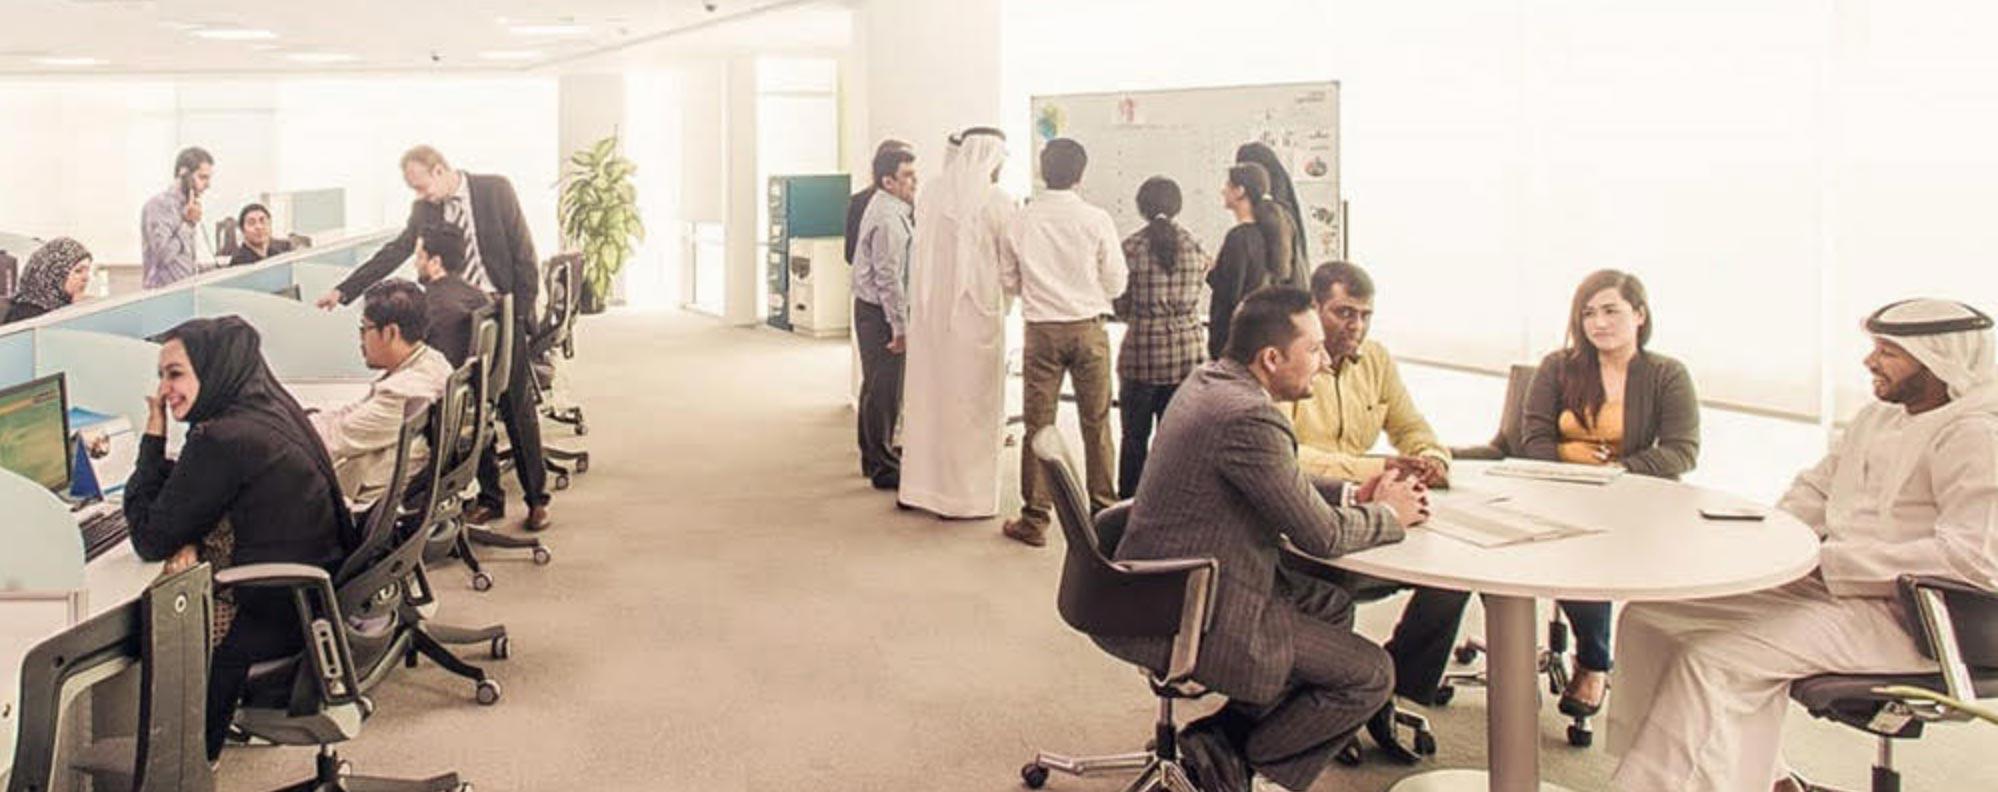 emirates-nbd-office.jpg